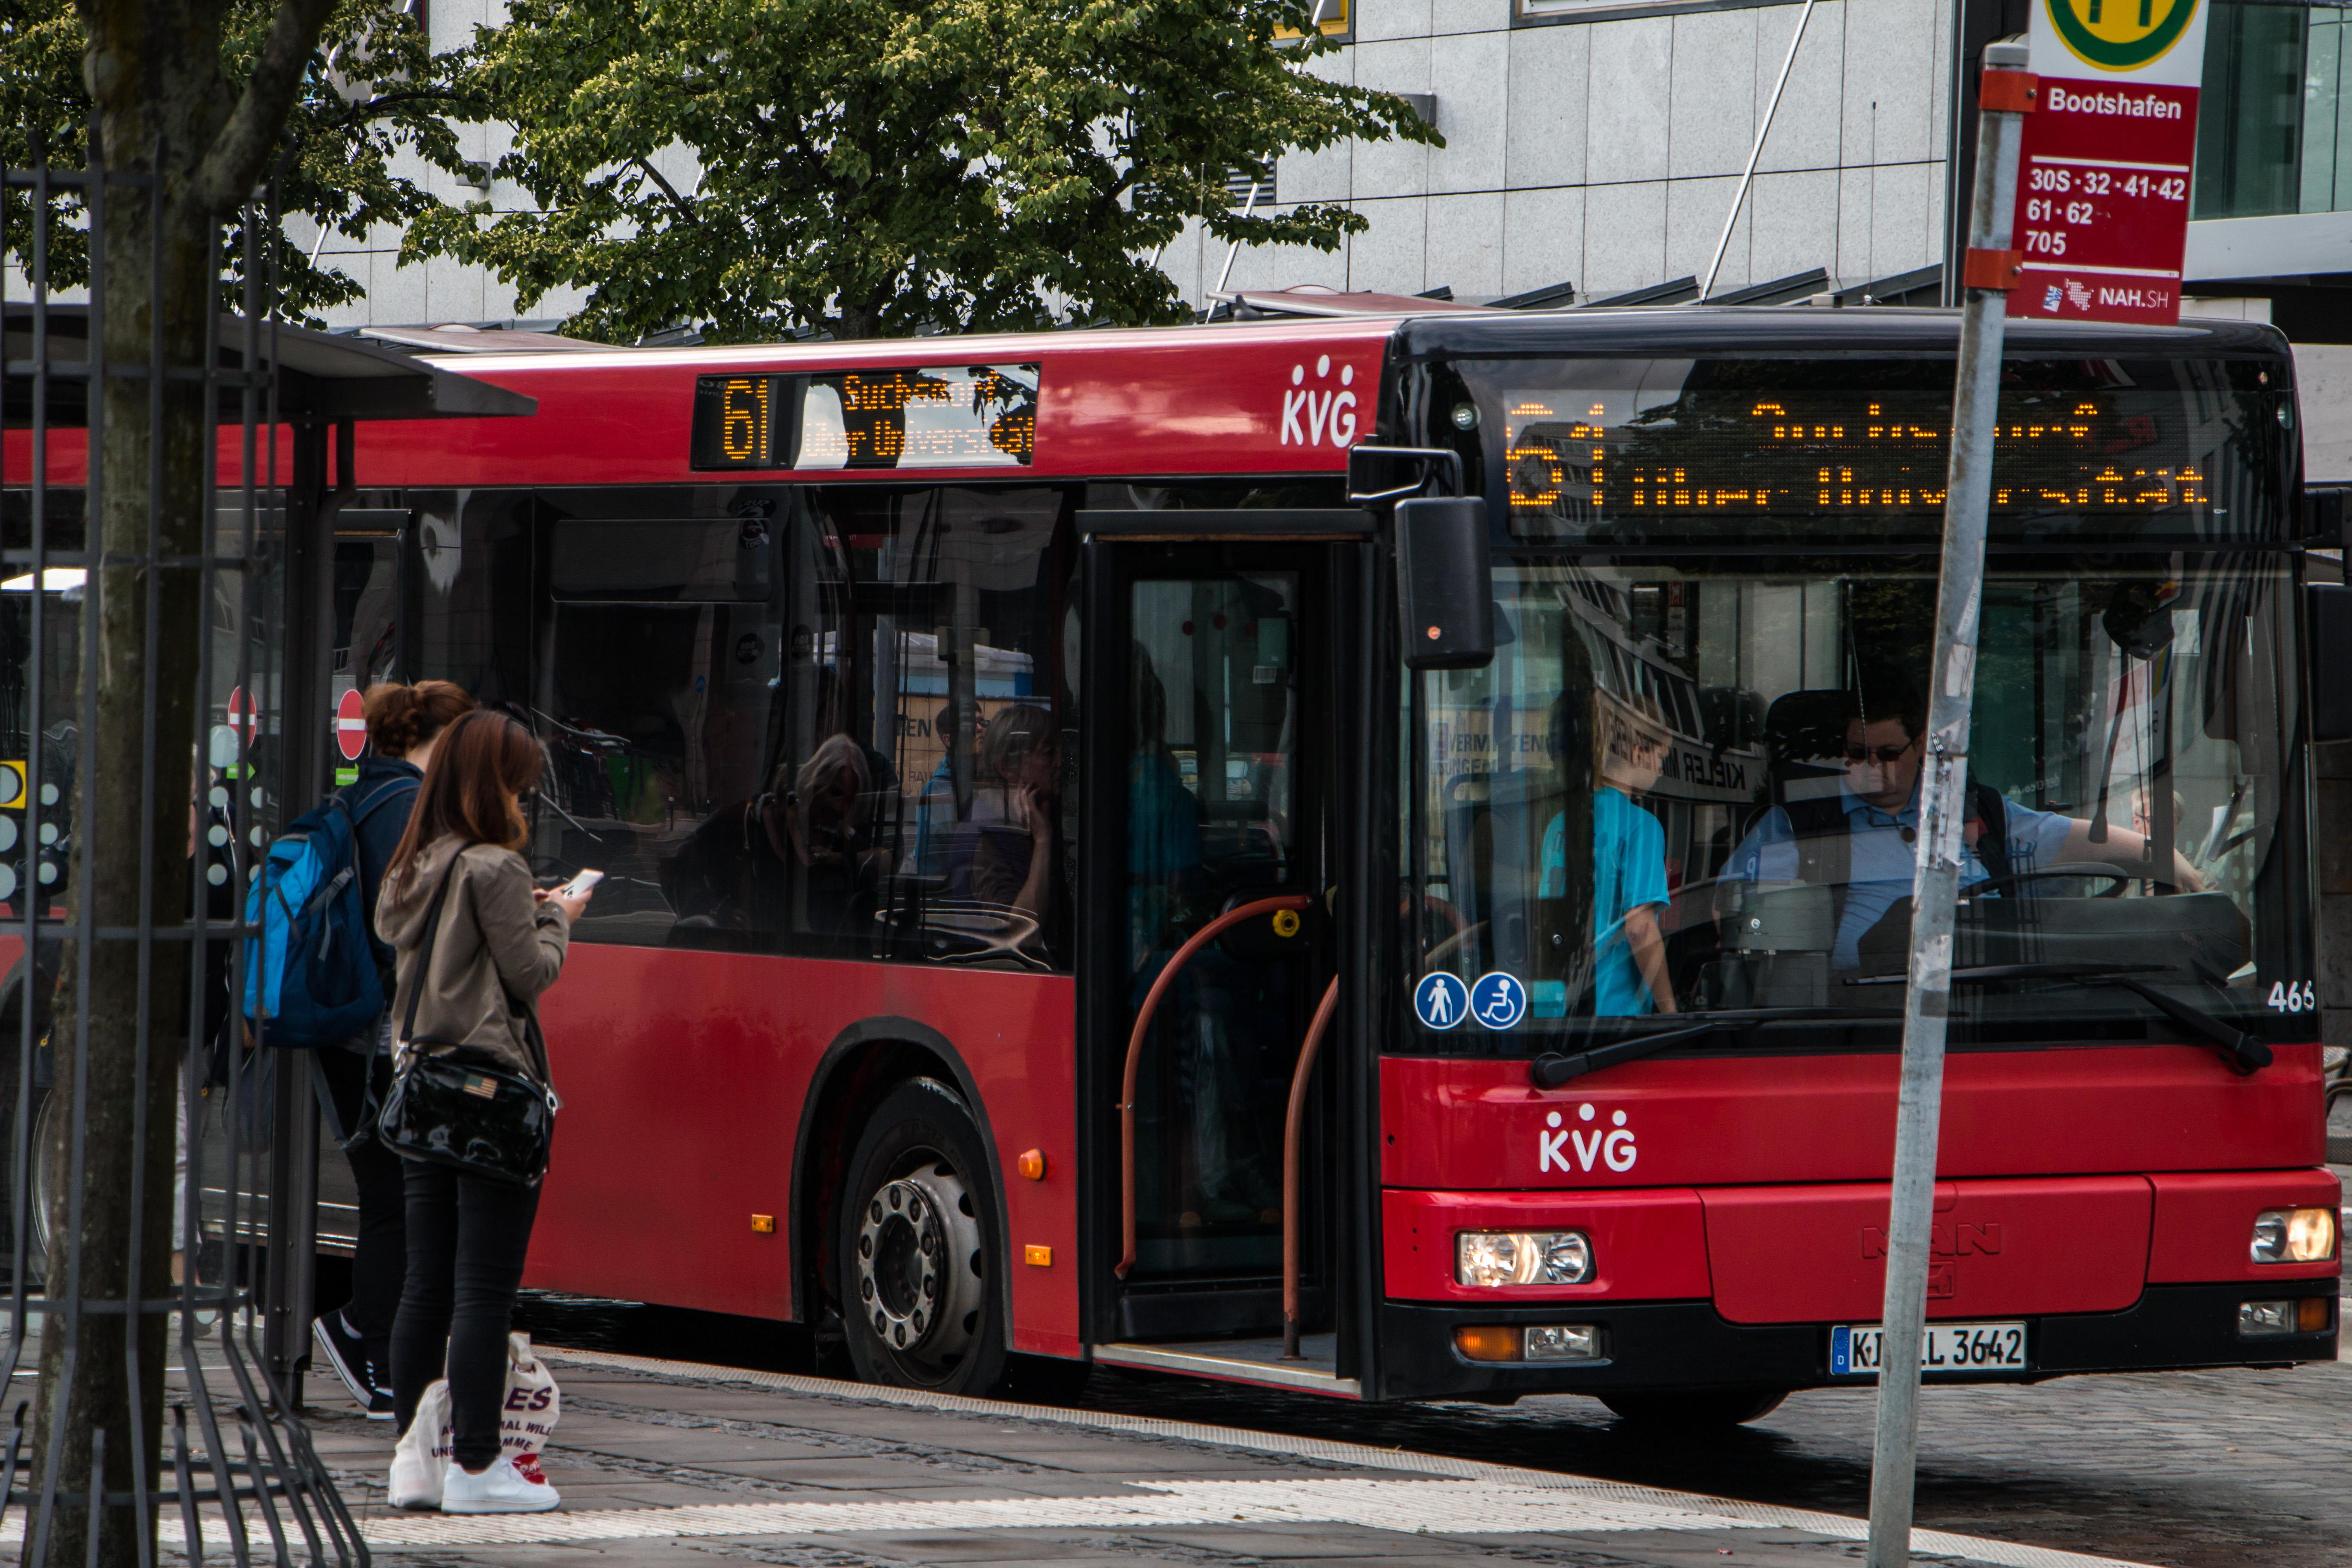 Bus at bus stop, Bus, City, Germany, Kiel, HQ Photo